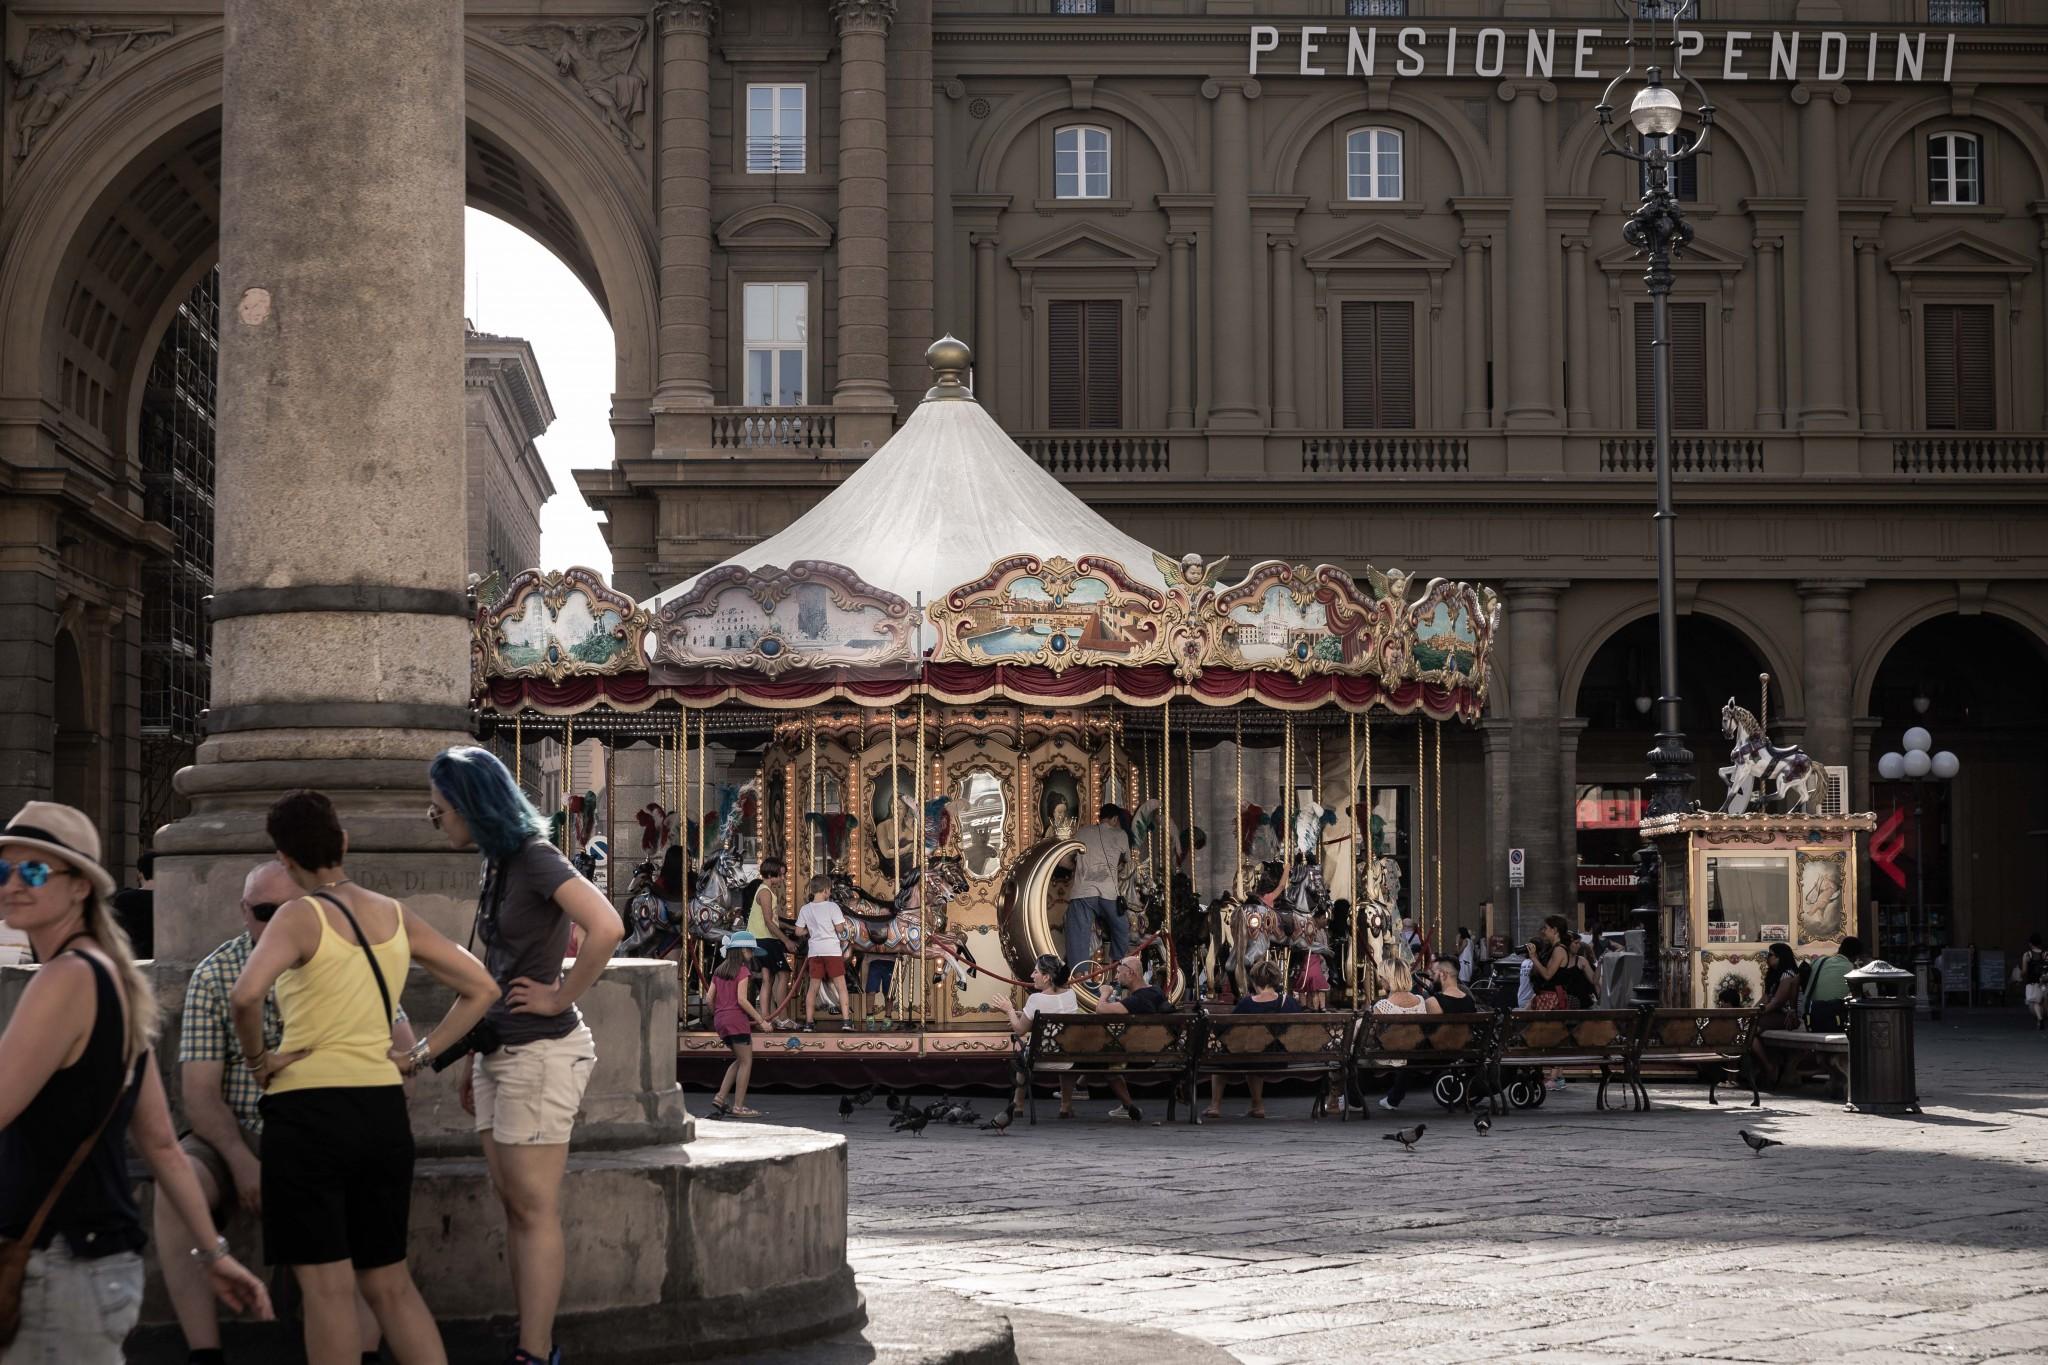 tuscany2 (13 of 39)